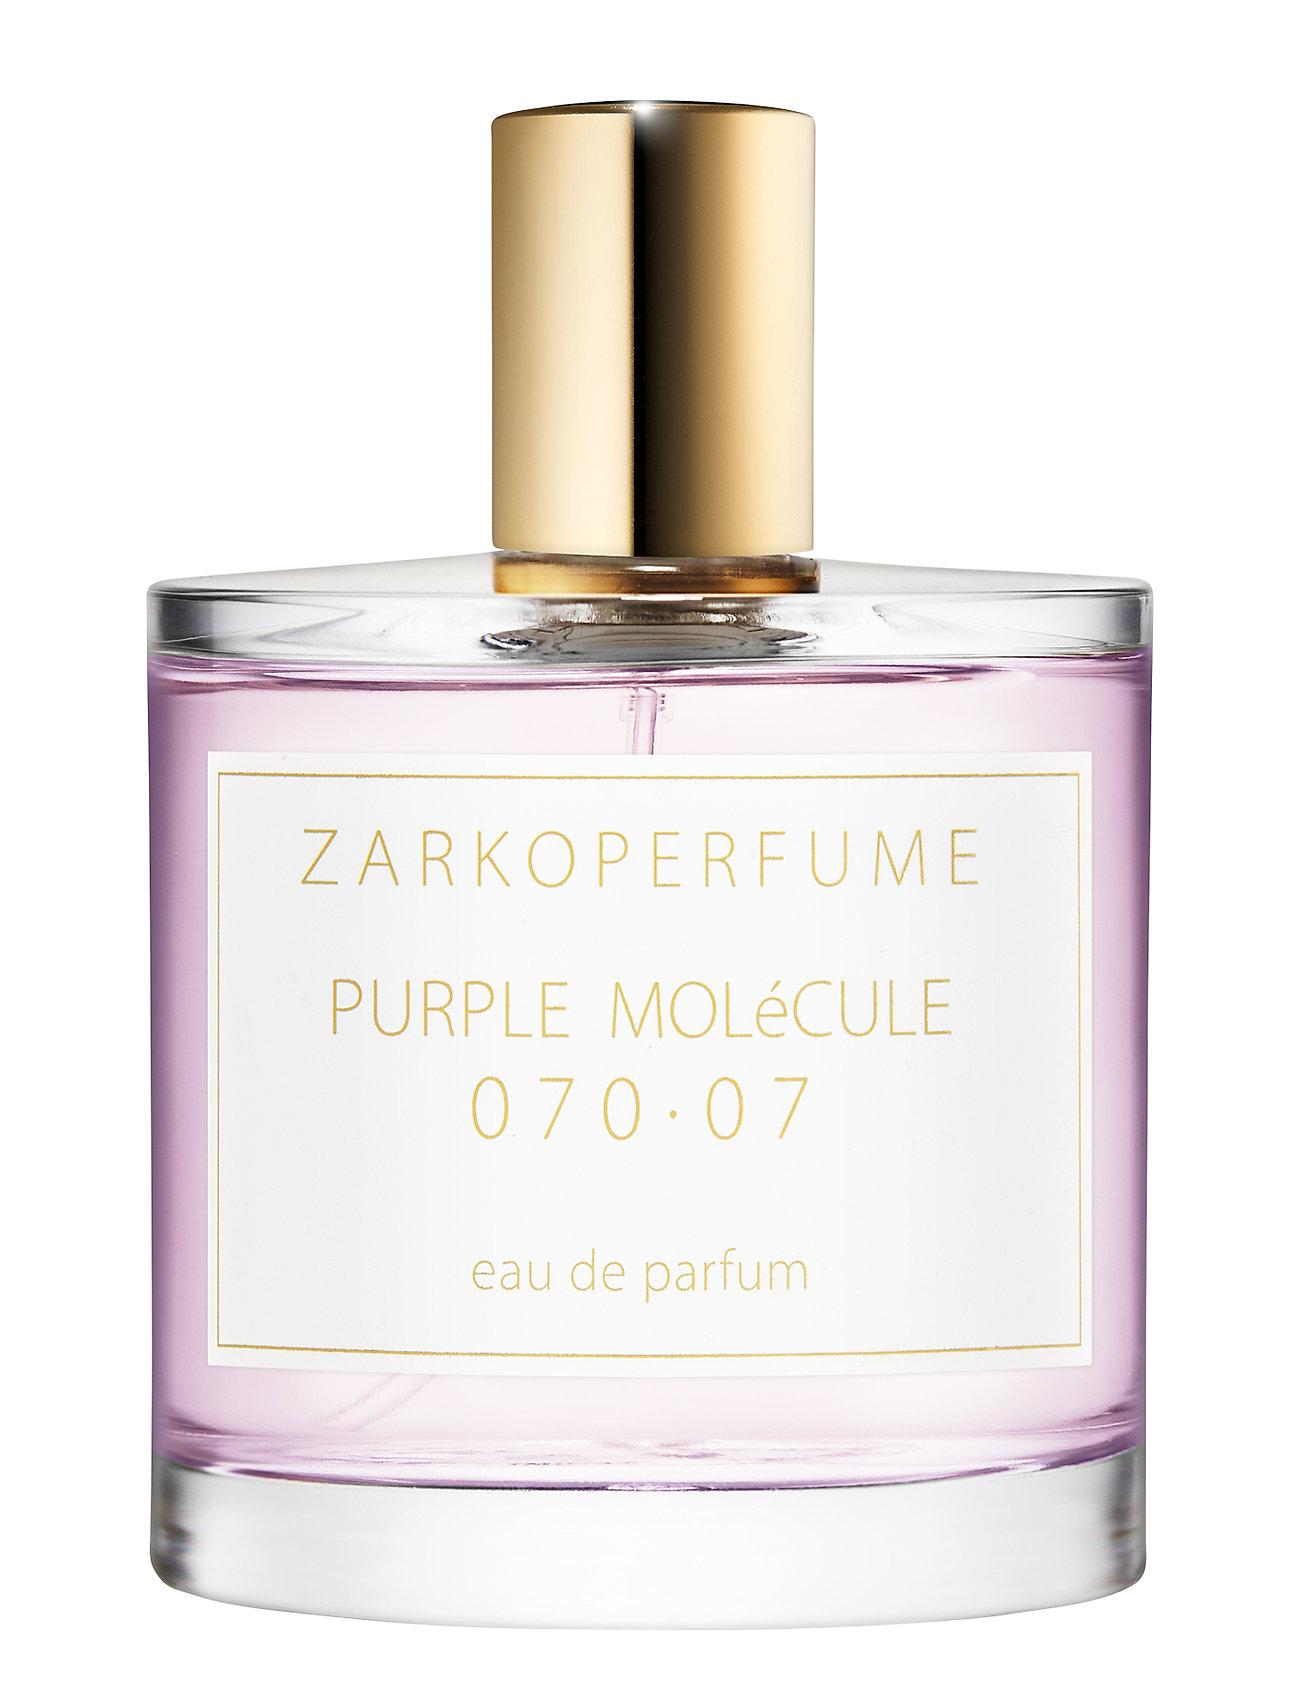 Zarkoperfume Purple Molecule - PURPLE